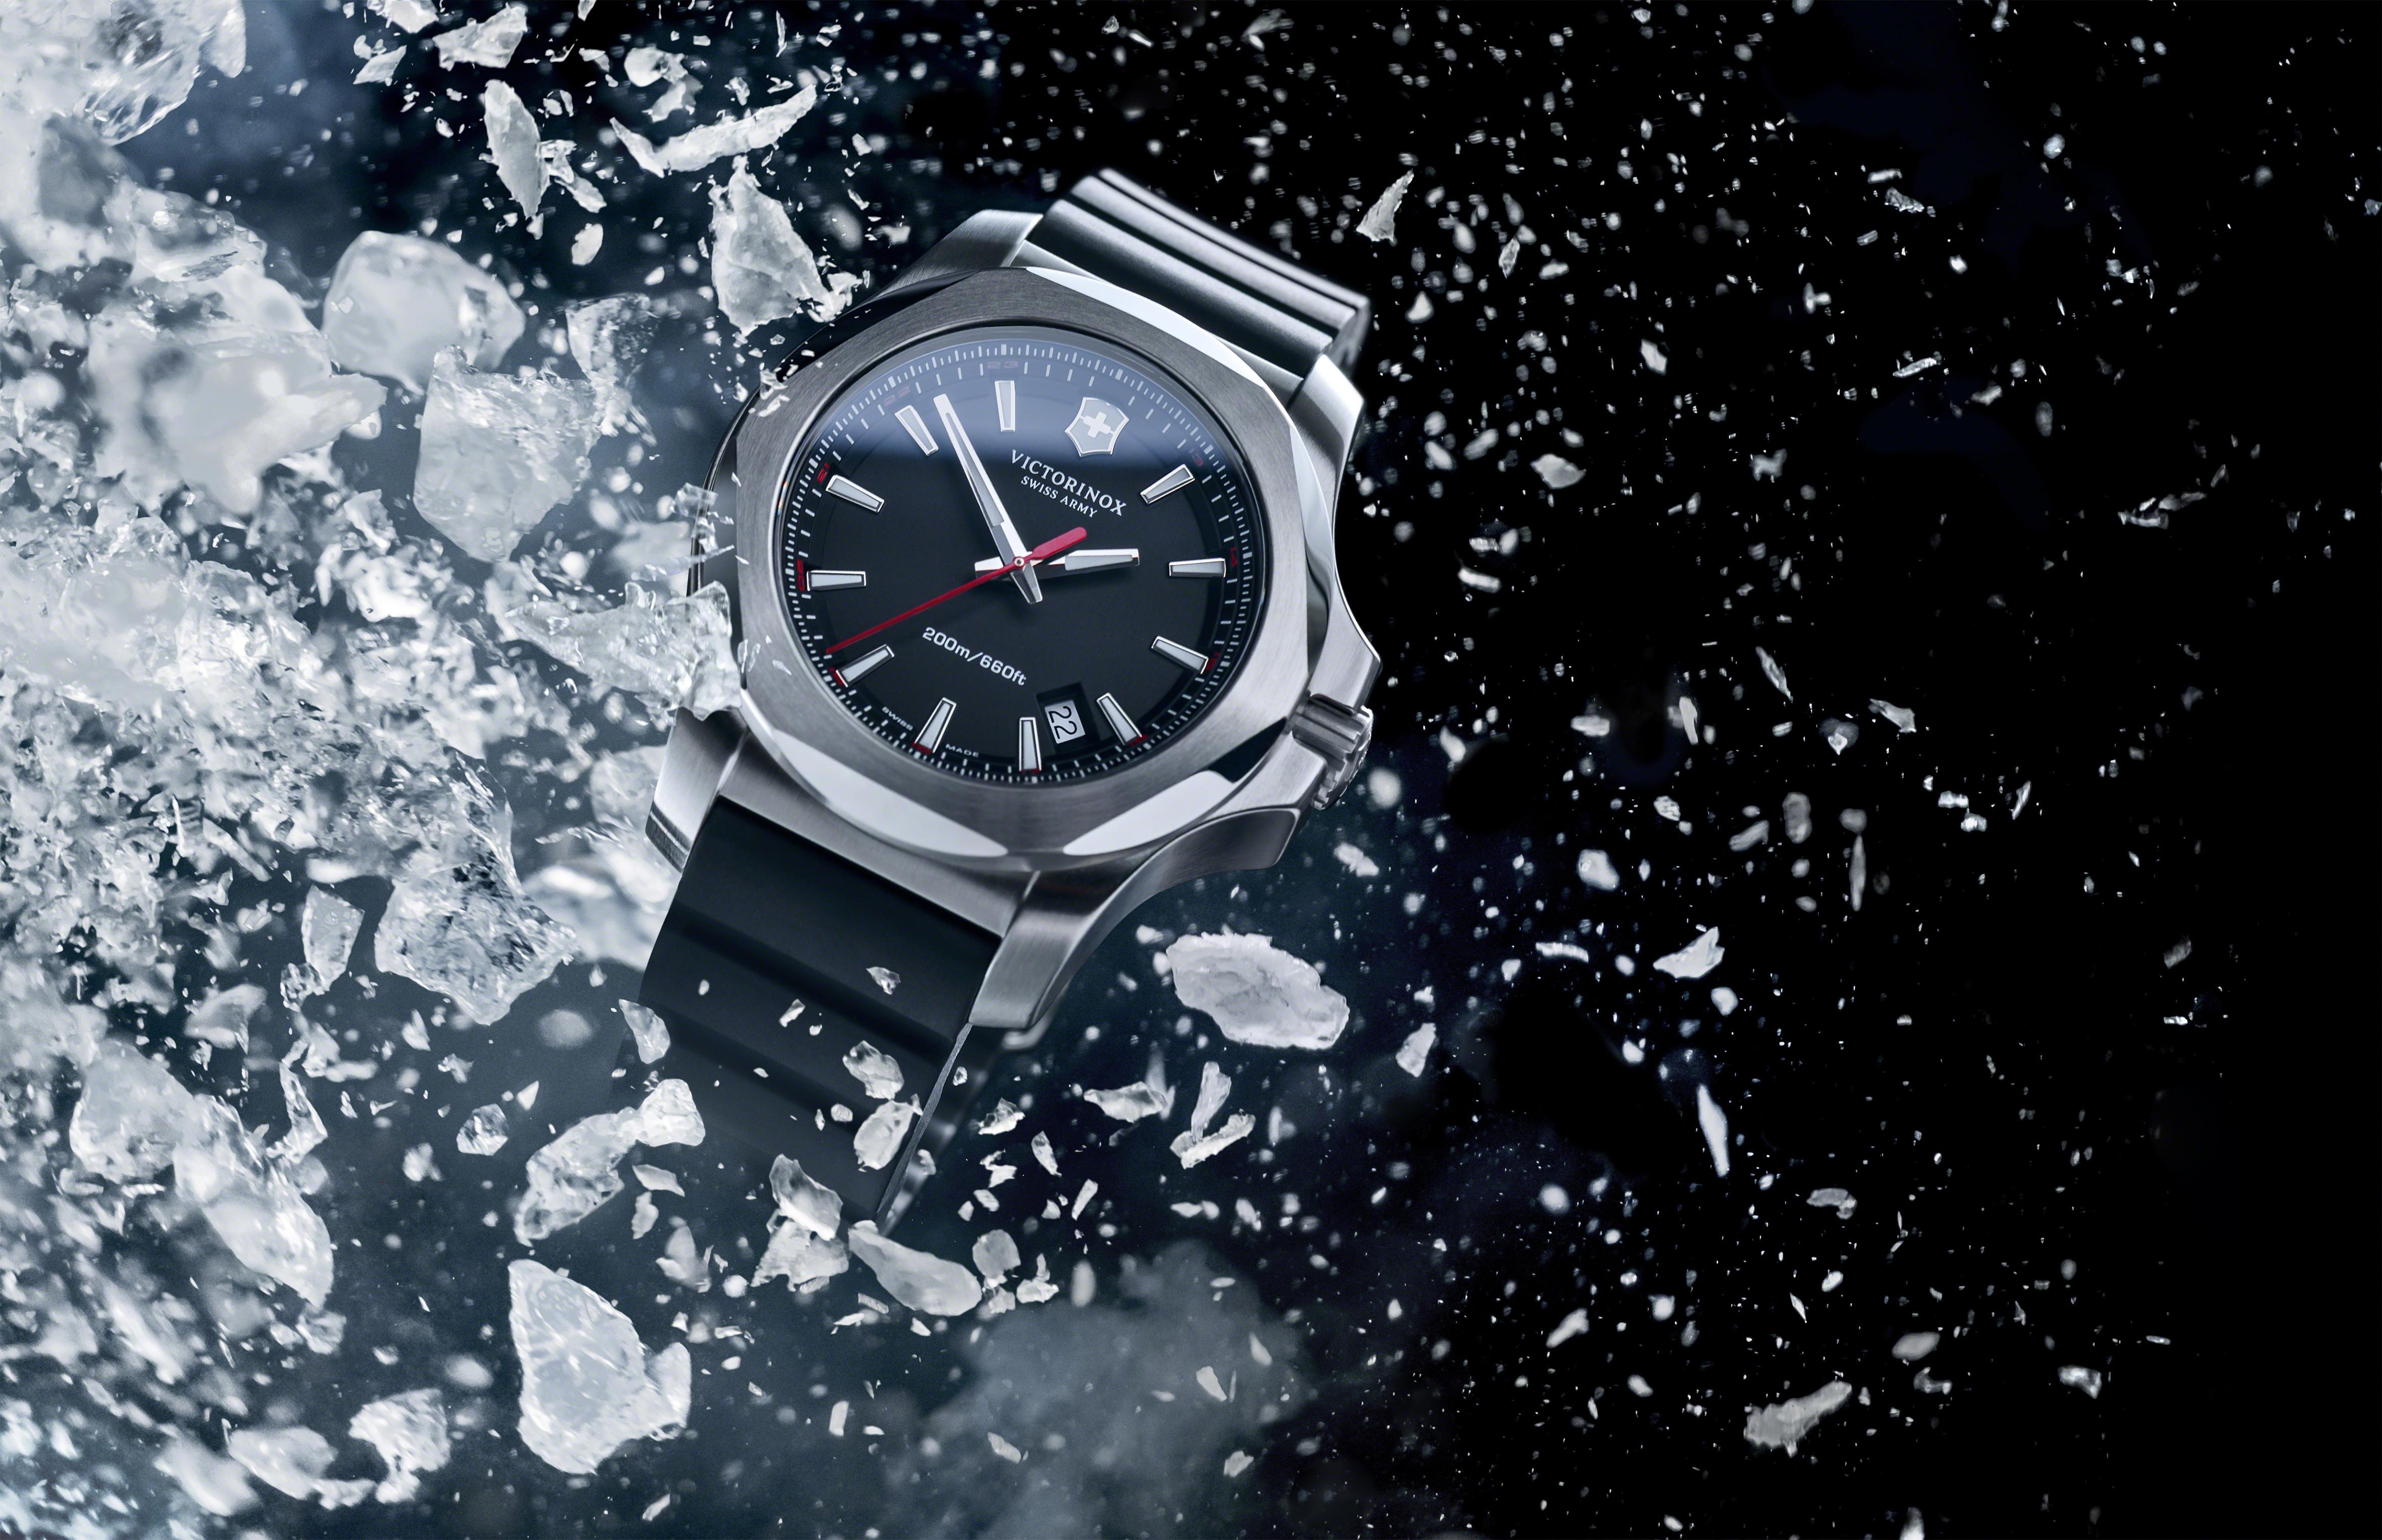 Victorinox-inox-watch-black